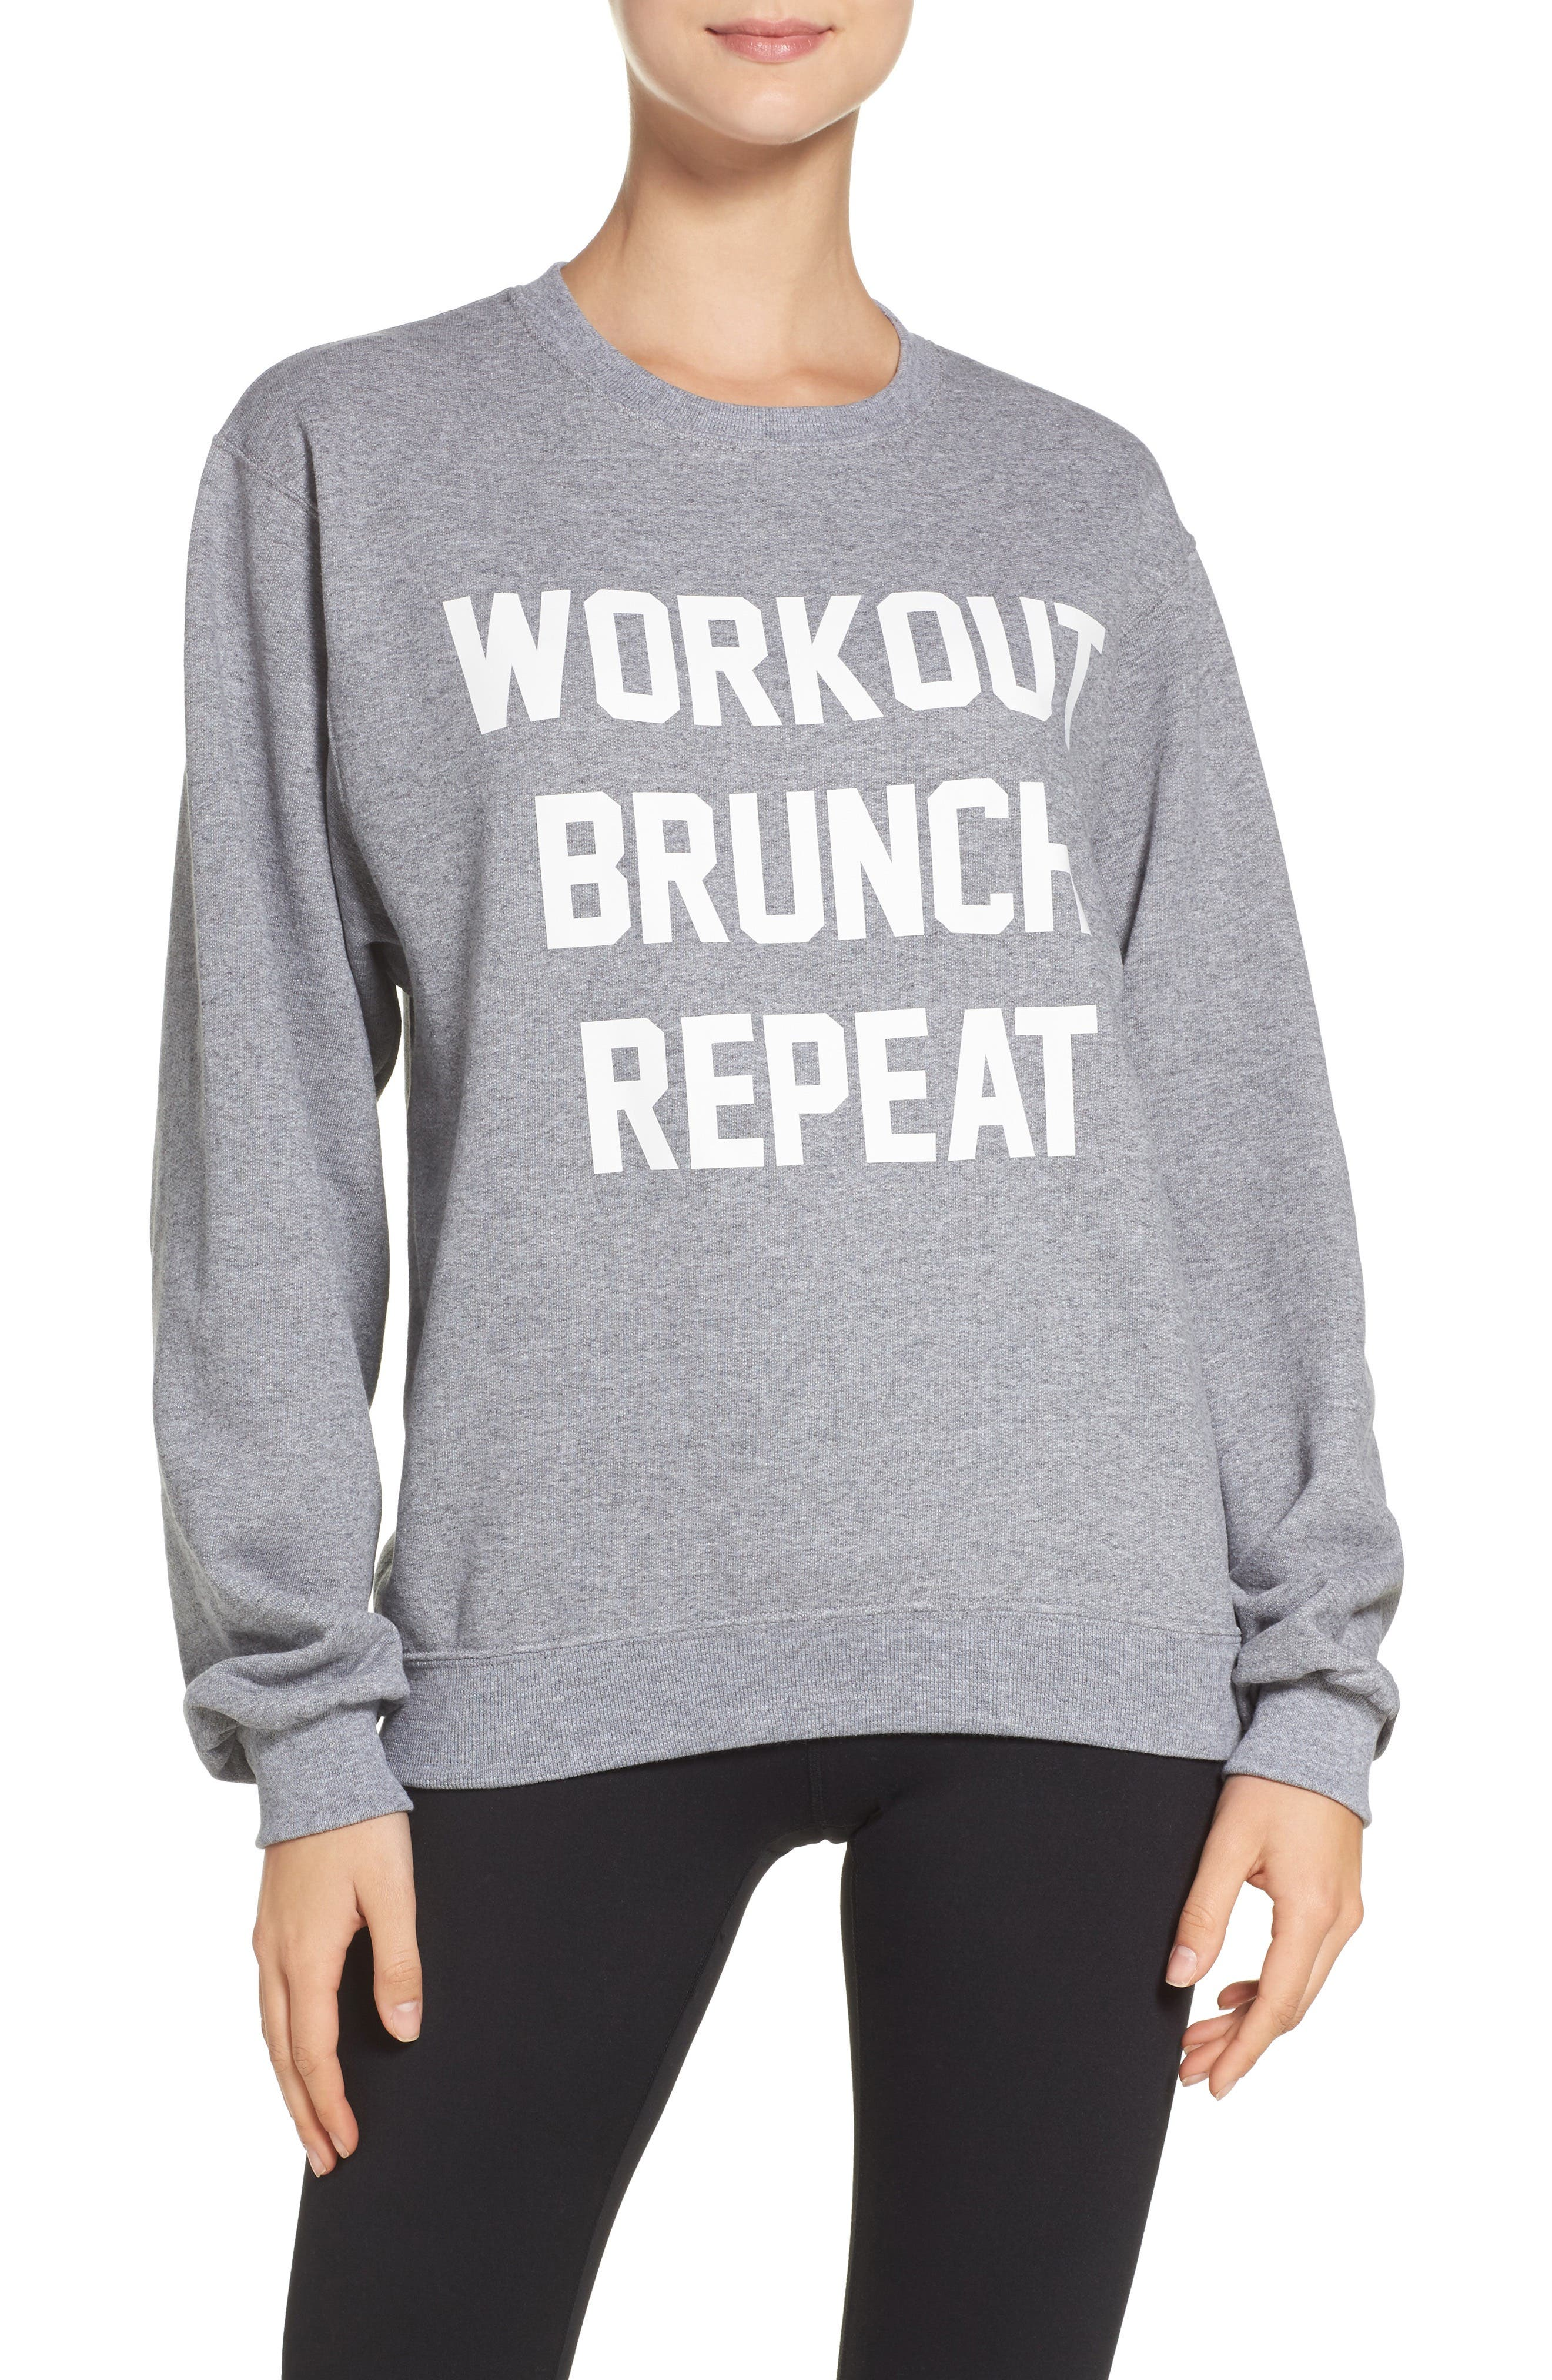 Workout Brunch Repeat Sweatshirt,                         Main,                         color, 020